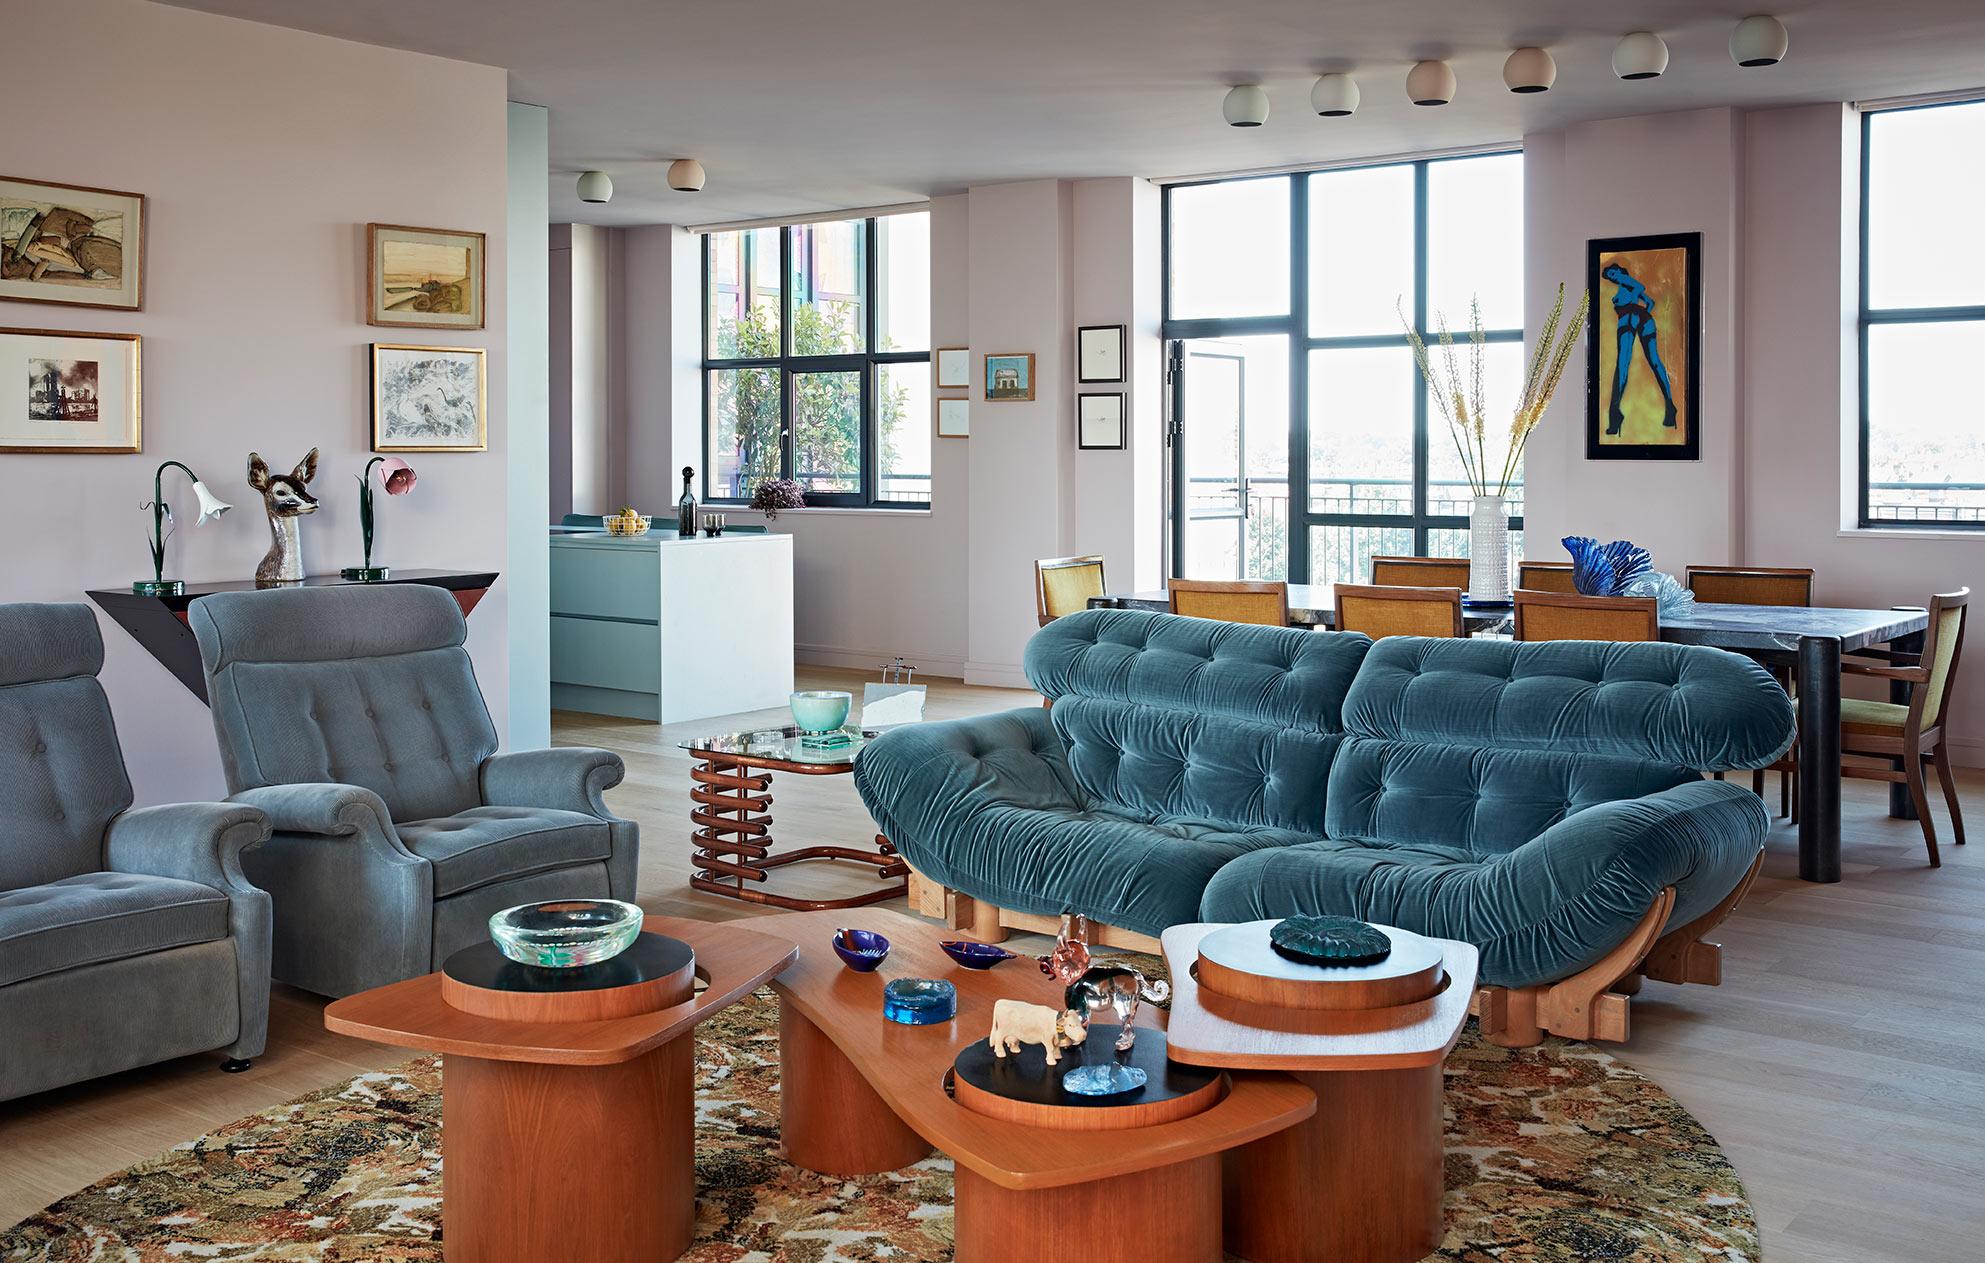 West London sitting room